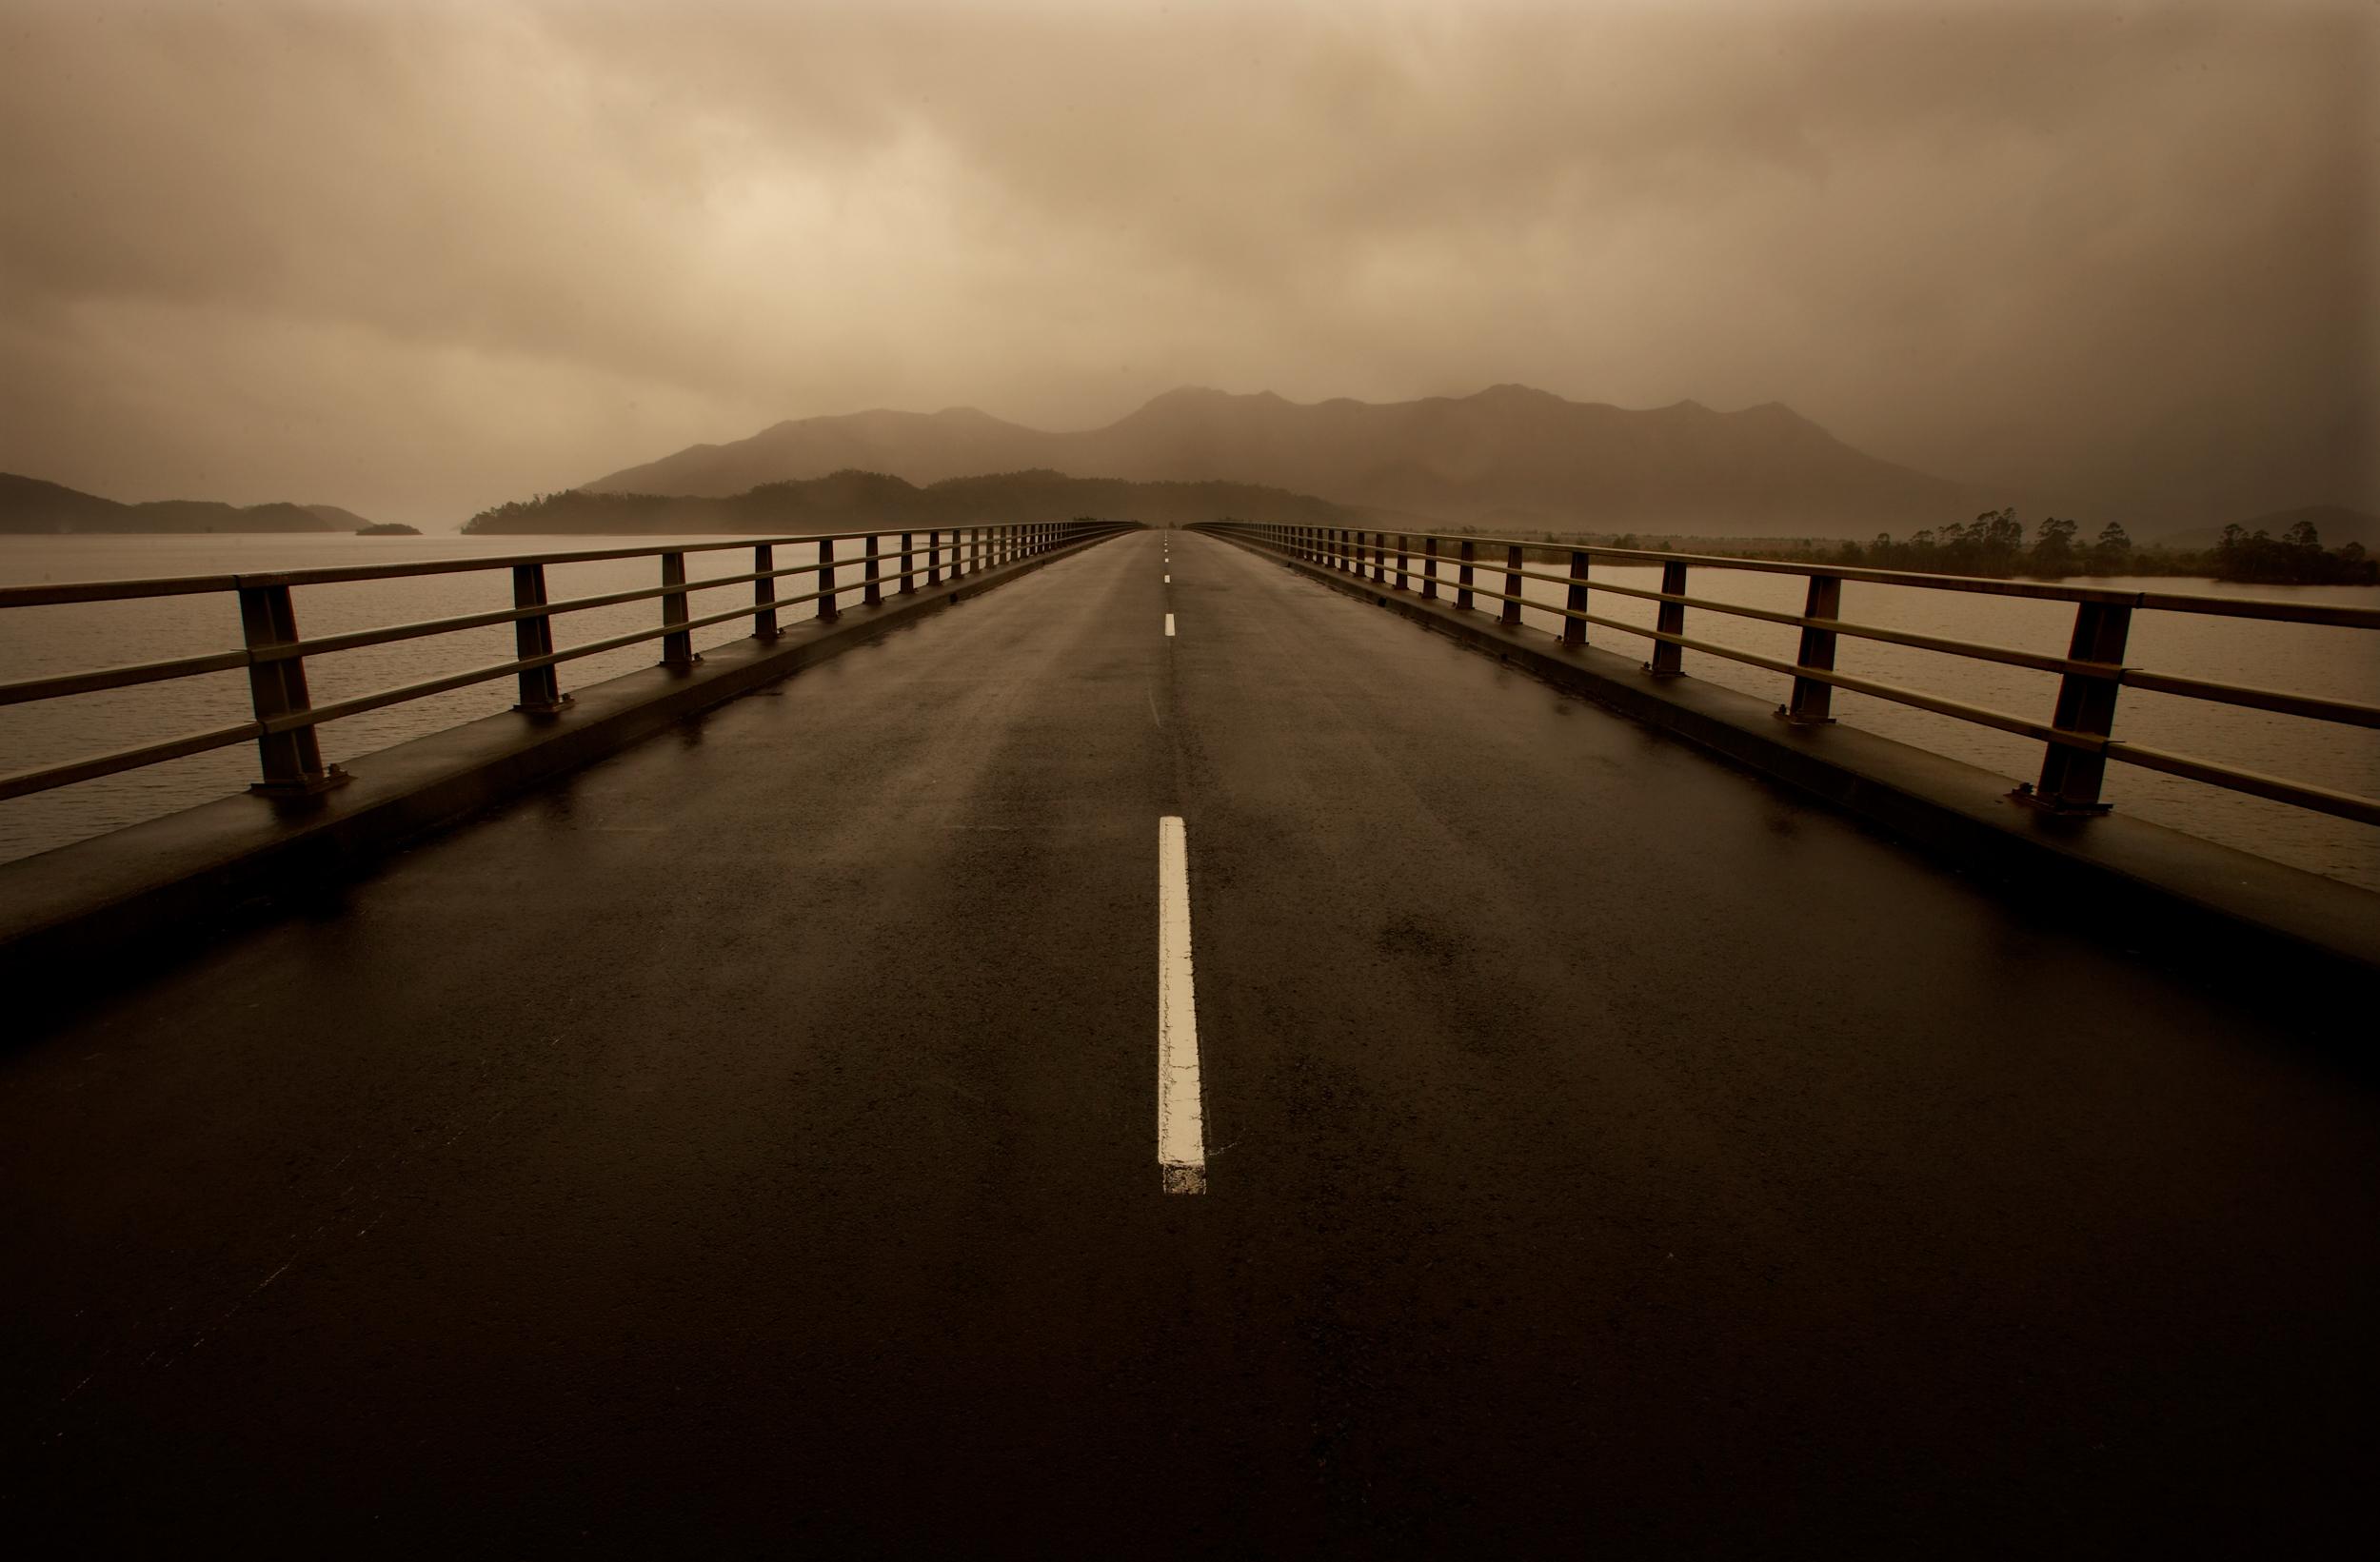 Peugeot_road.jpg